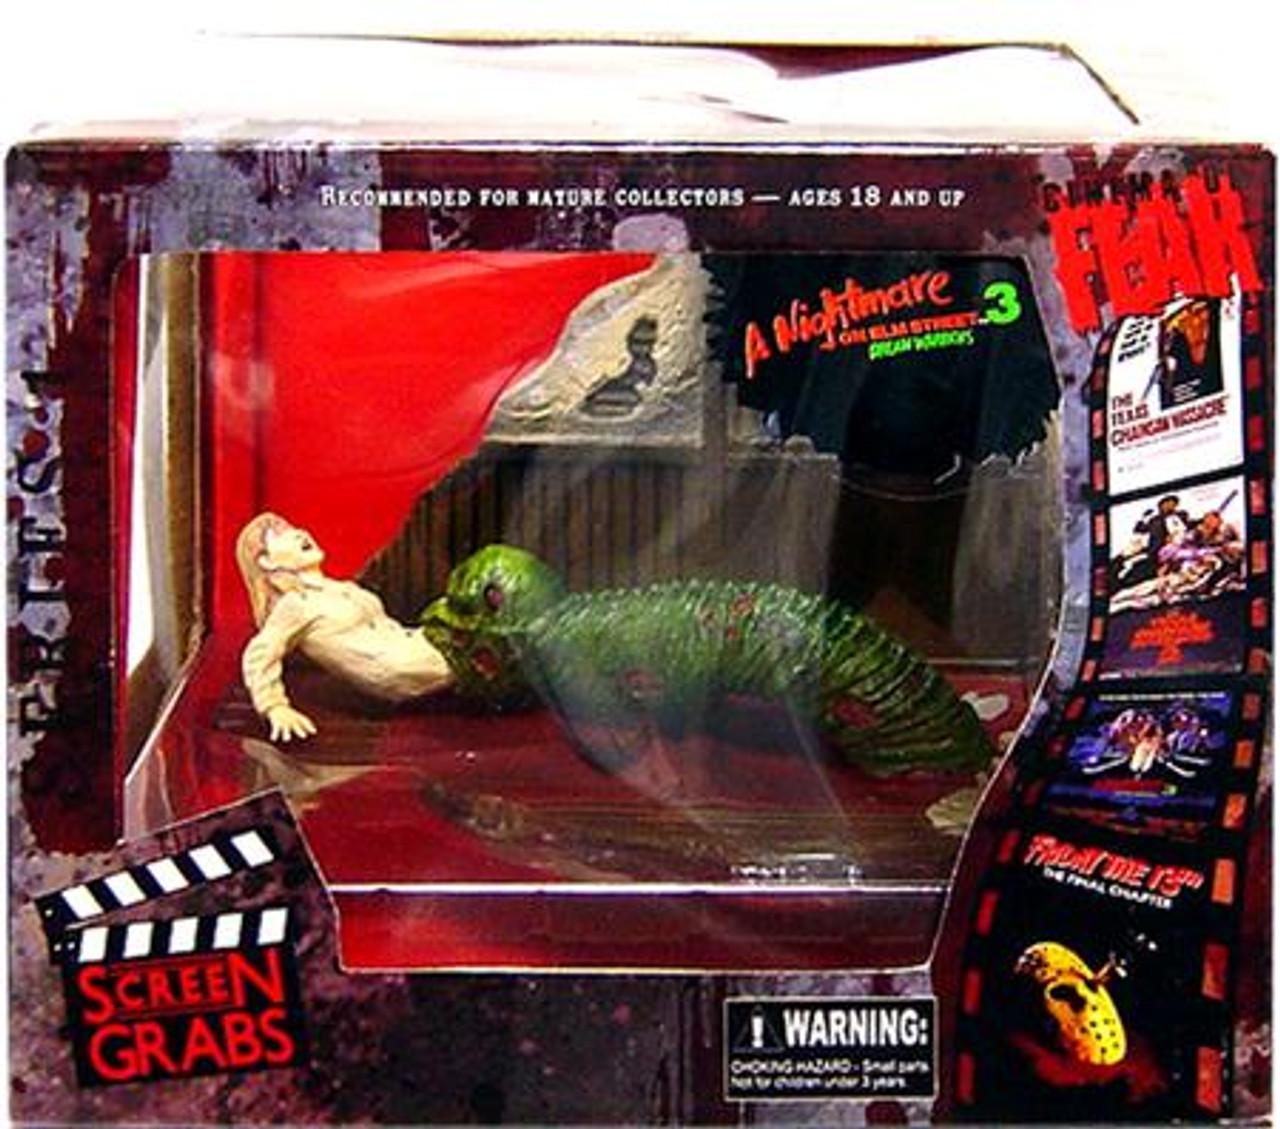 Cinema of Fear Screen Grabs Series 1 A Nightmare On Elm Street 3: Dream Warriors Diorama